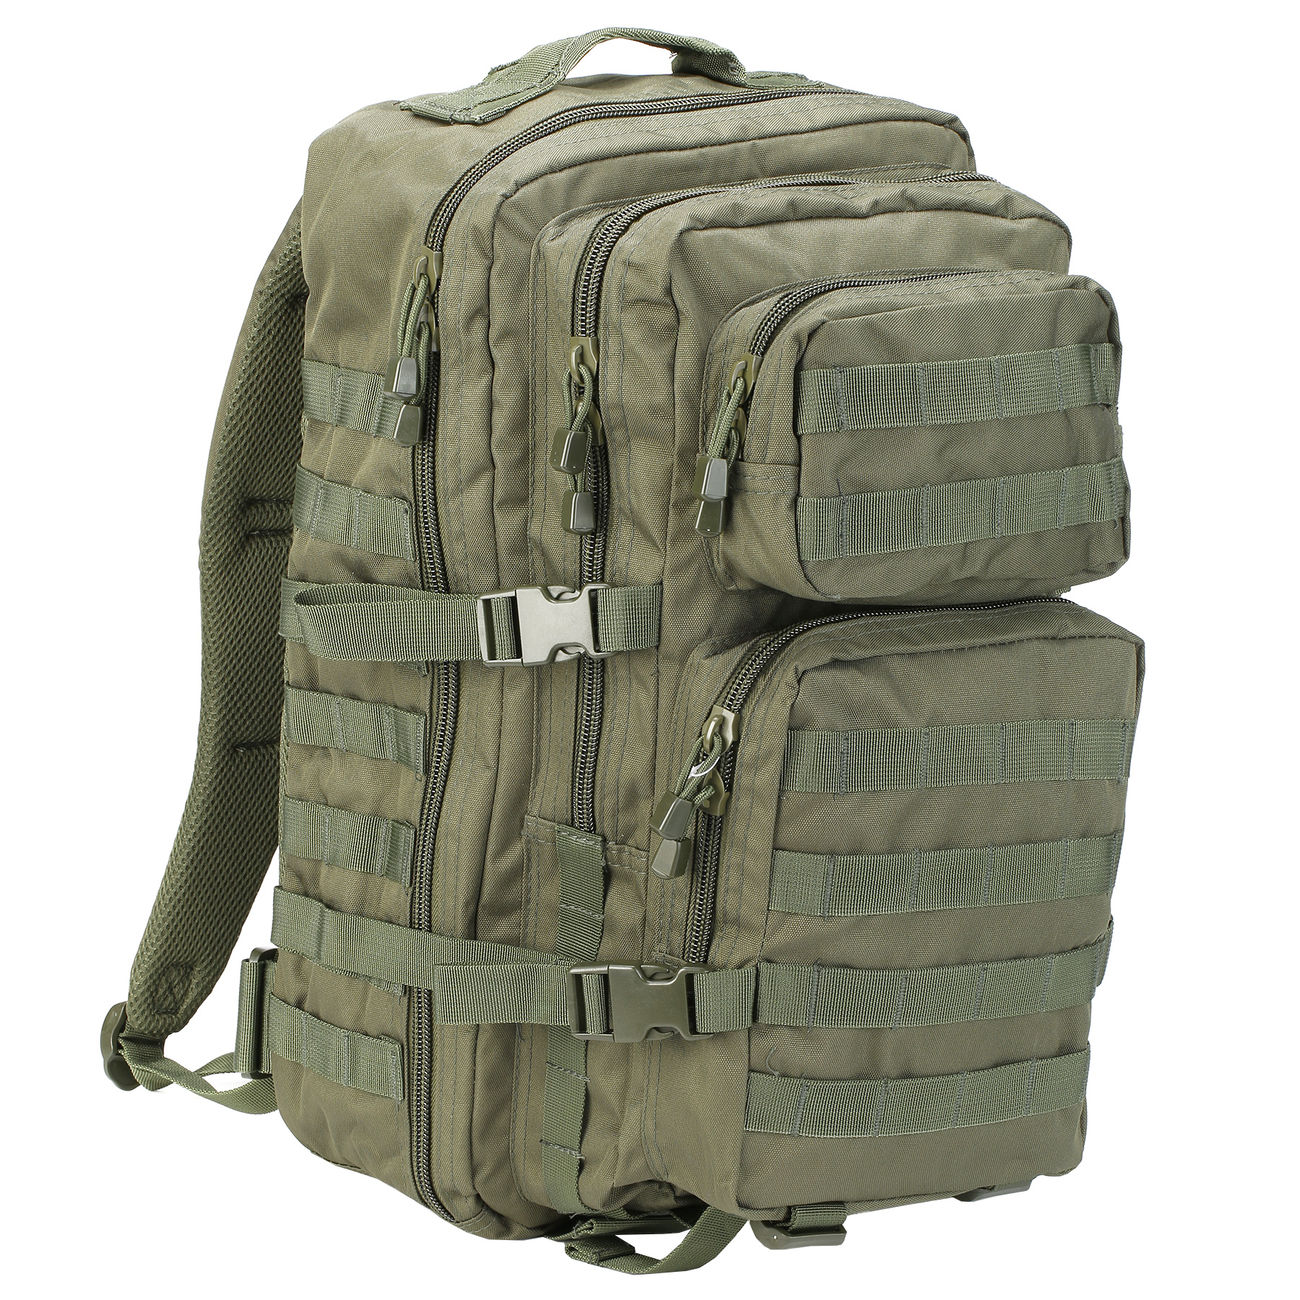 1a24860b2872b Mil-Tec Rucksack US Assault Pack II 40 Liter oliv günstig kaufen ...